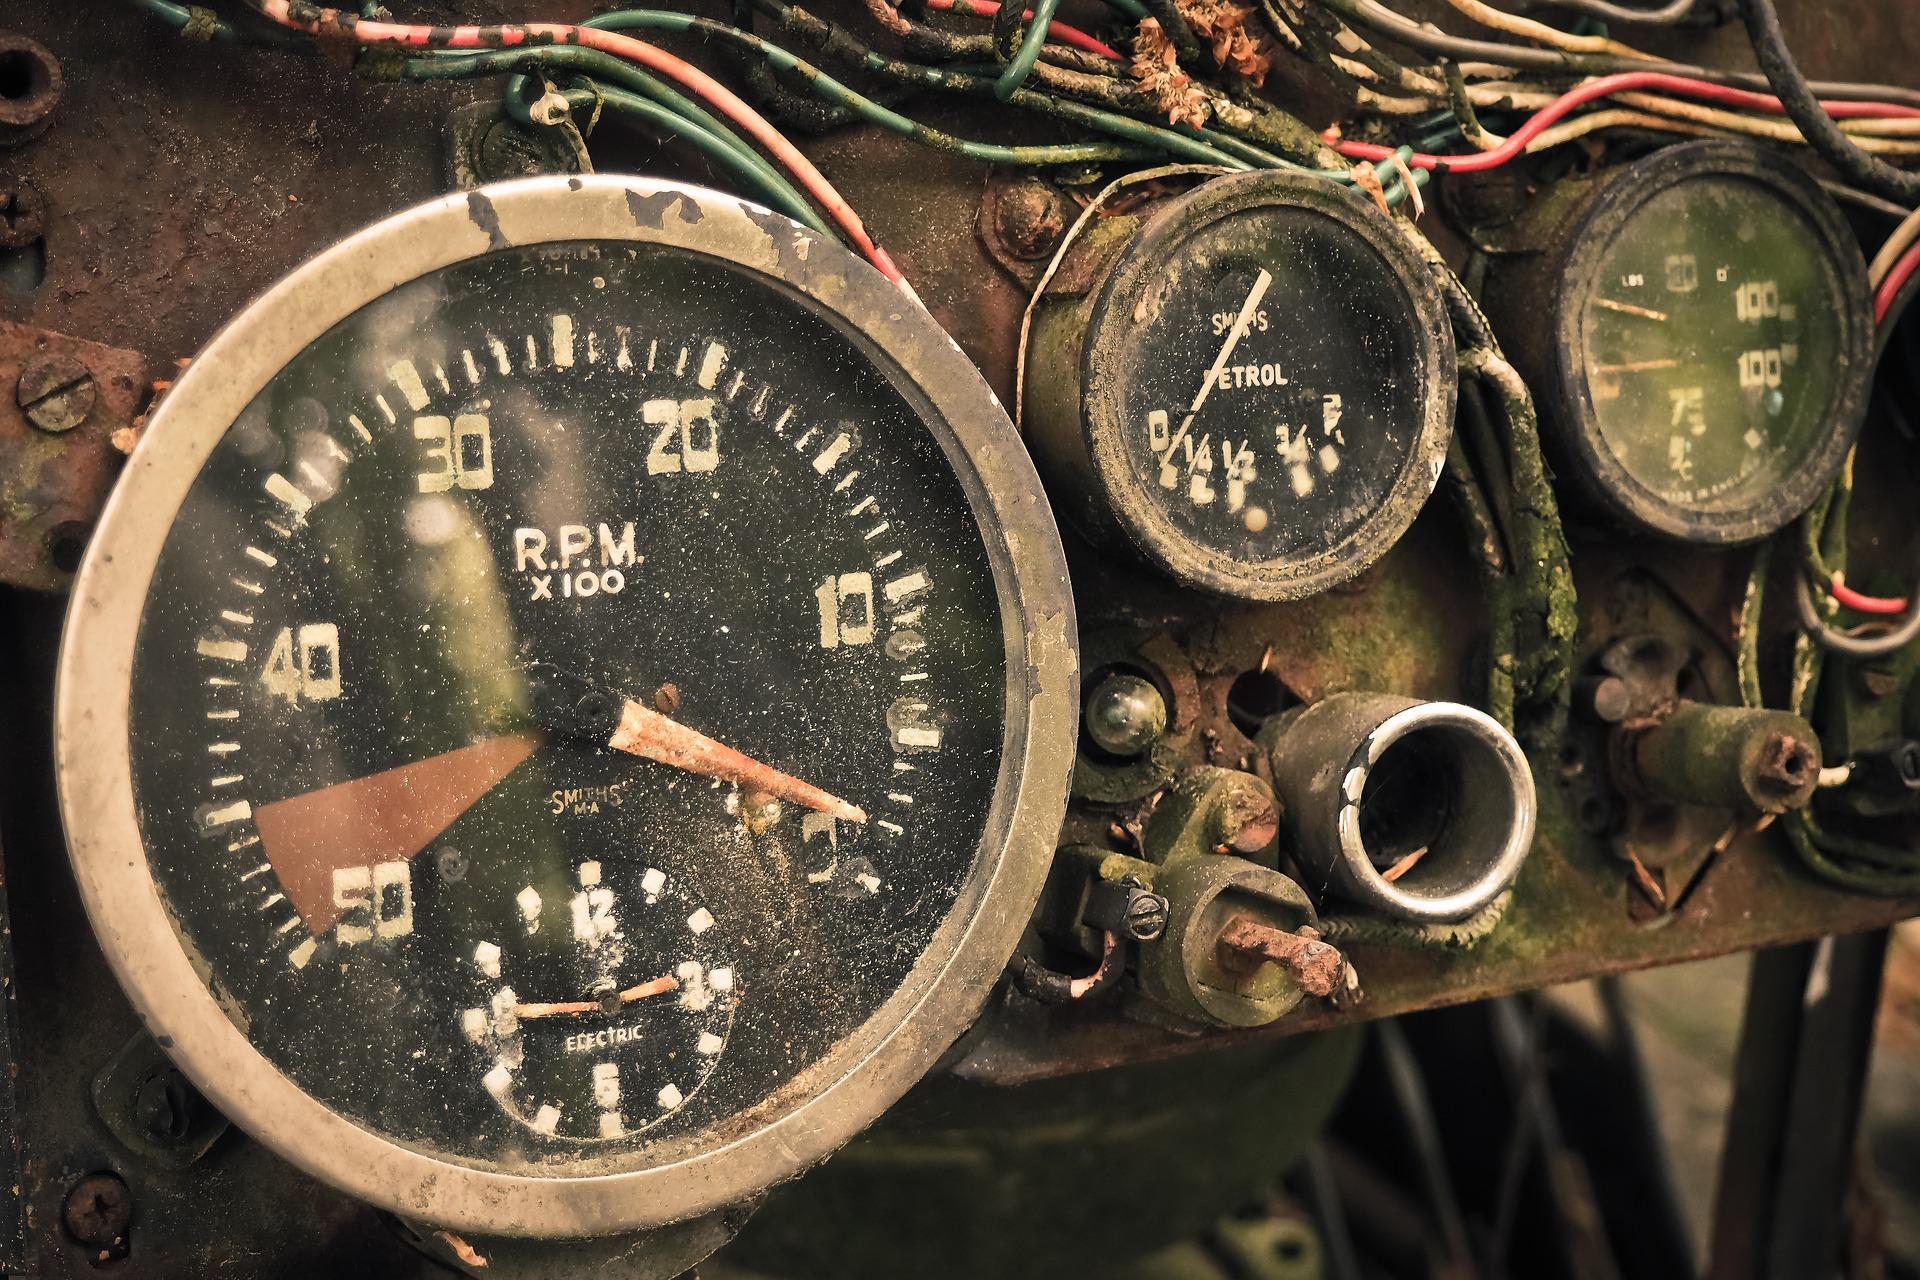 Logging download speed of transmission-daemon